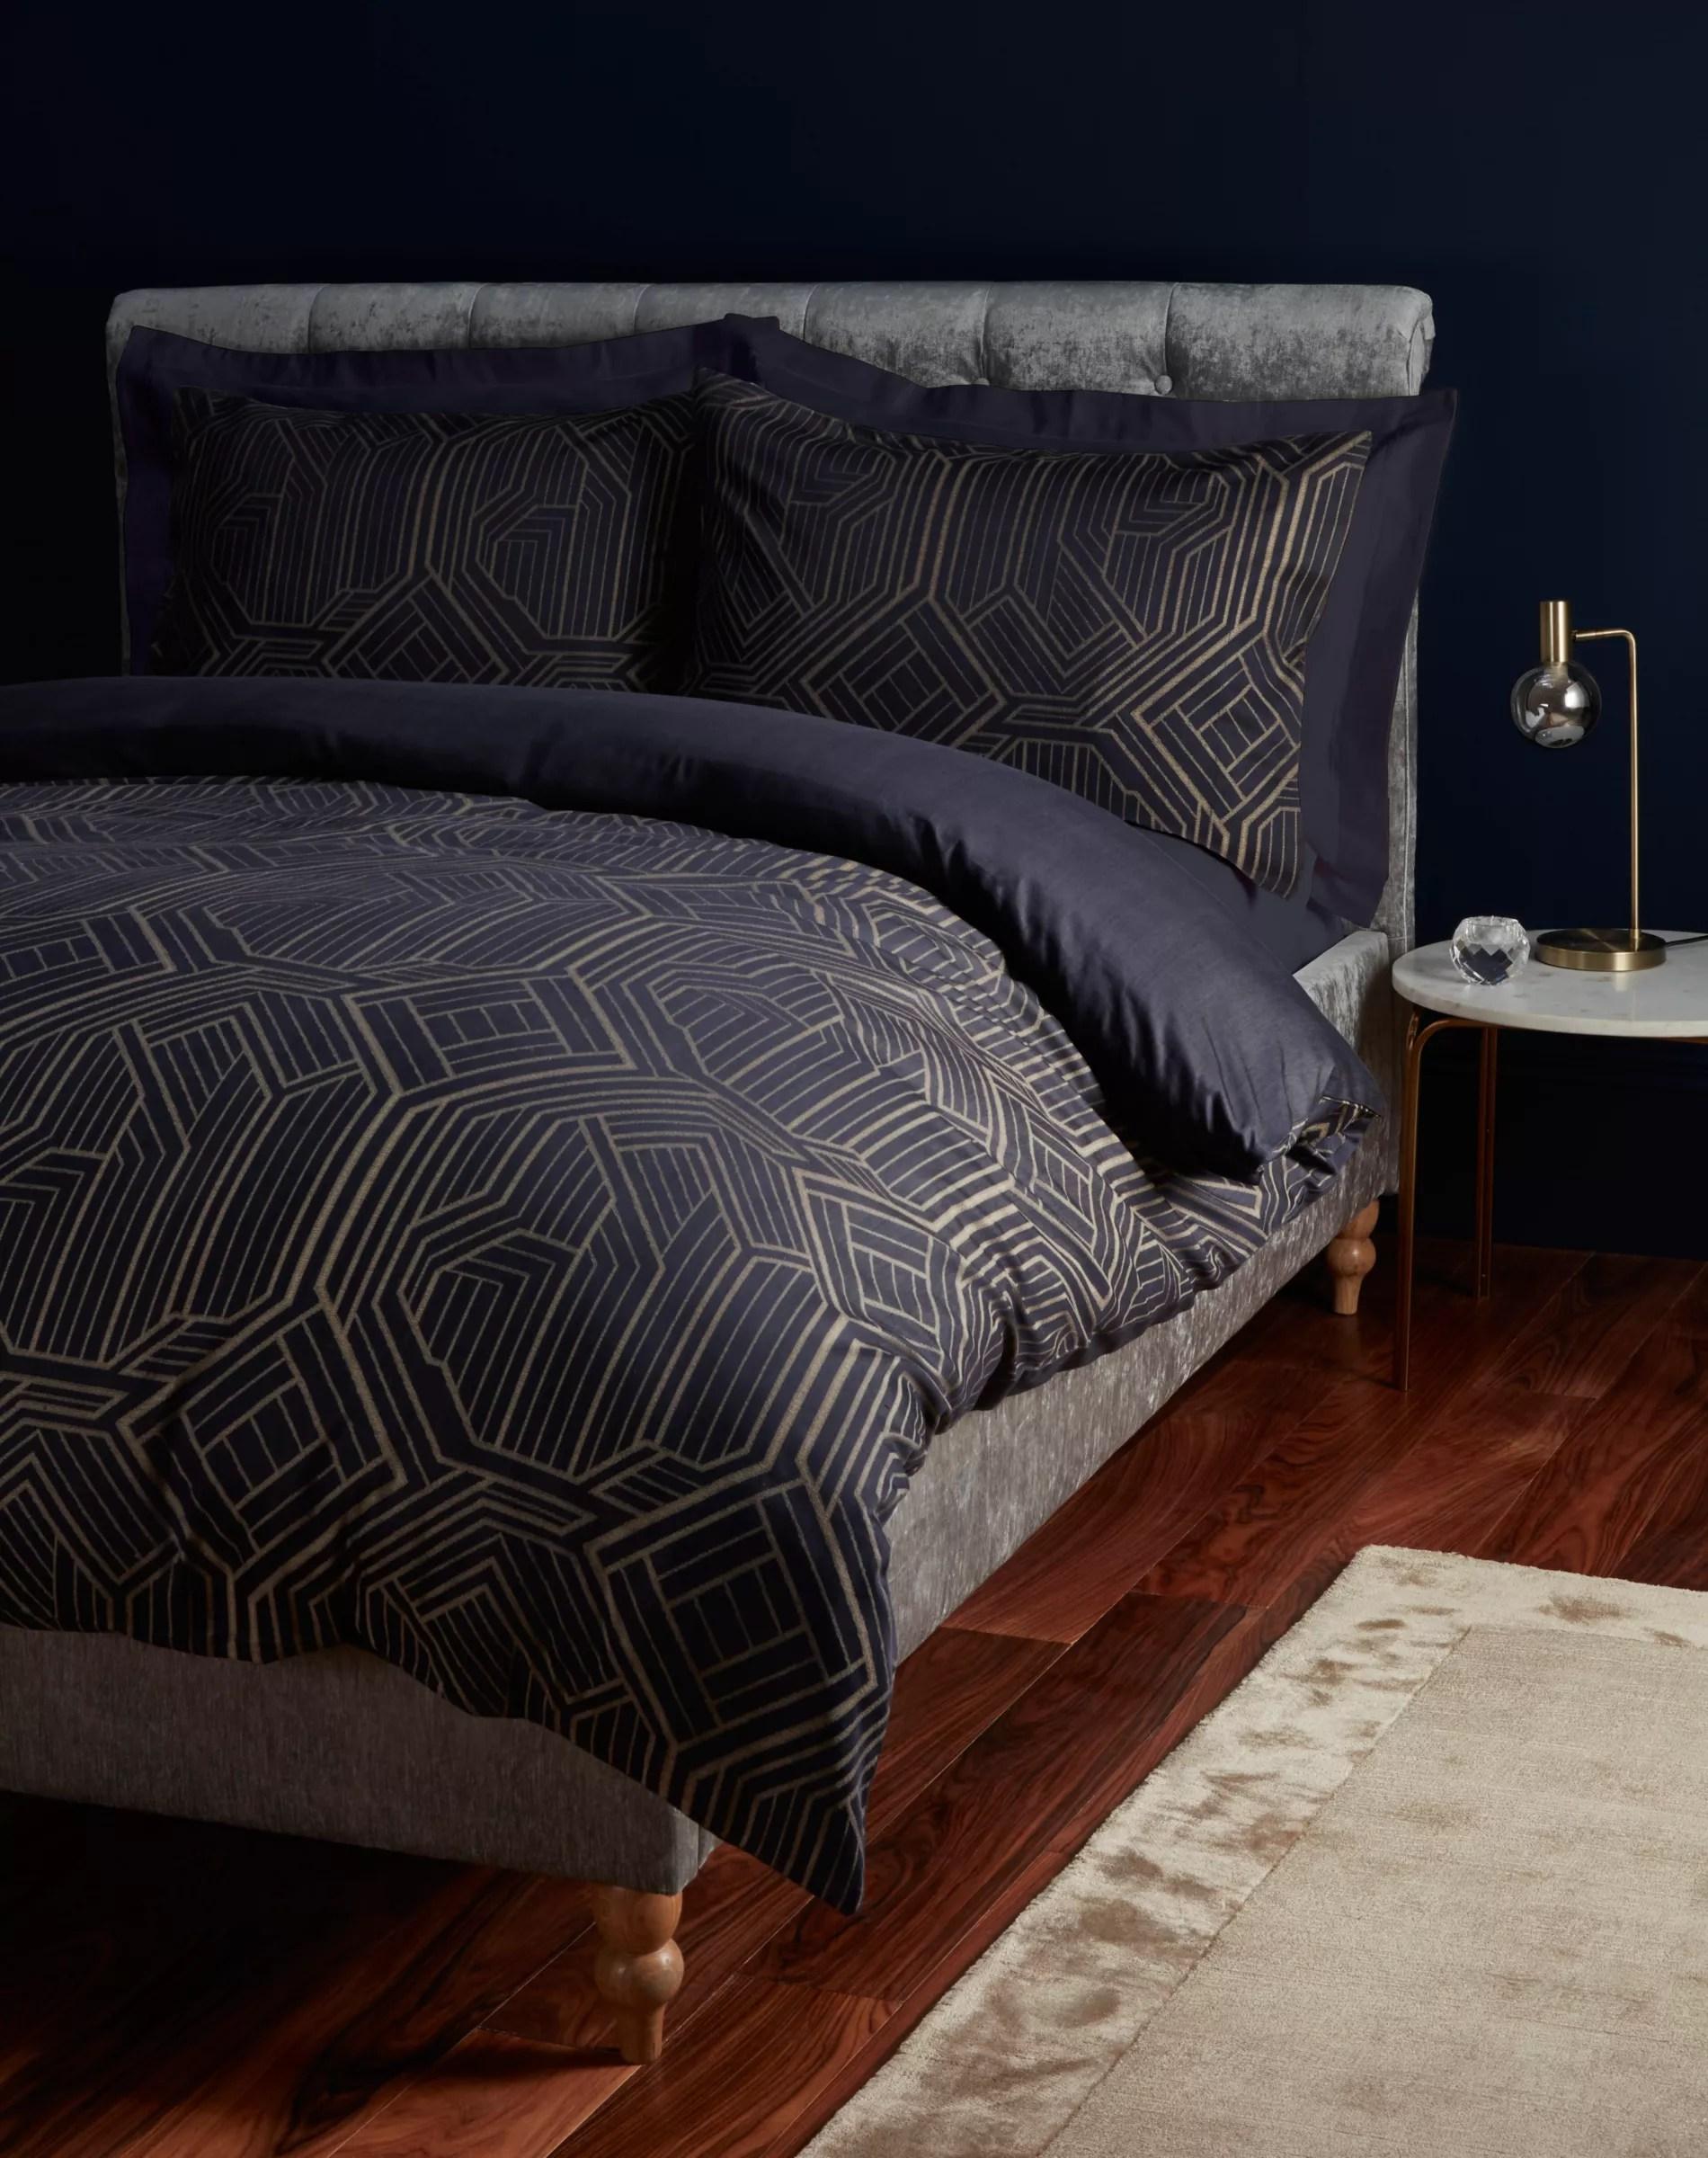 Art Deco Comforter : comforter, Style, Bedding, Inspiration